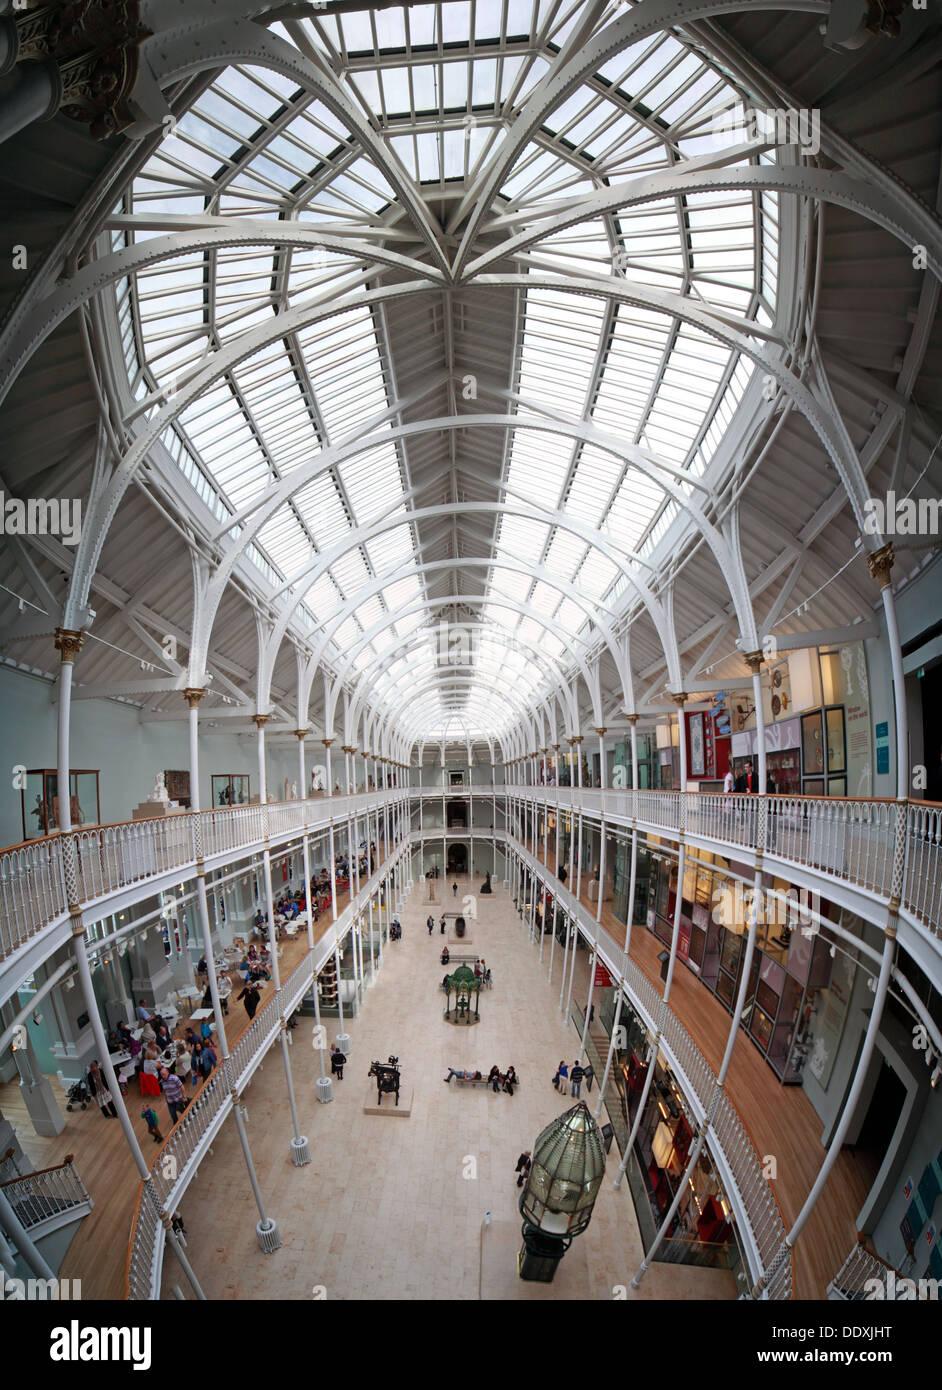 Laden Sie dieses Alamy Stockfoto National Museum of Scotland Interieur, Kammern St Edinburgh Stadt, Scotland UK EH1 1JF - DDXJHT